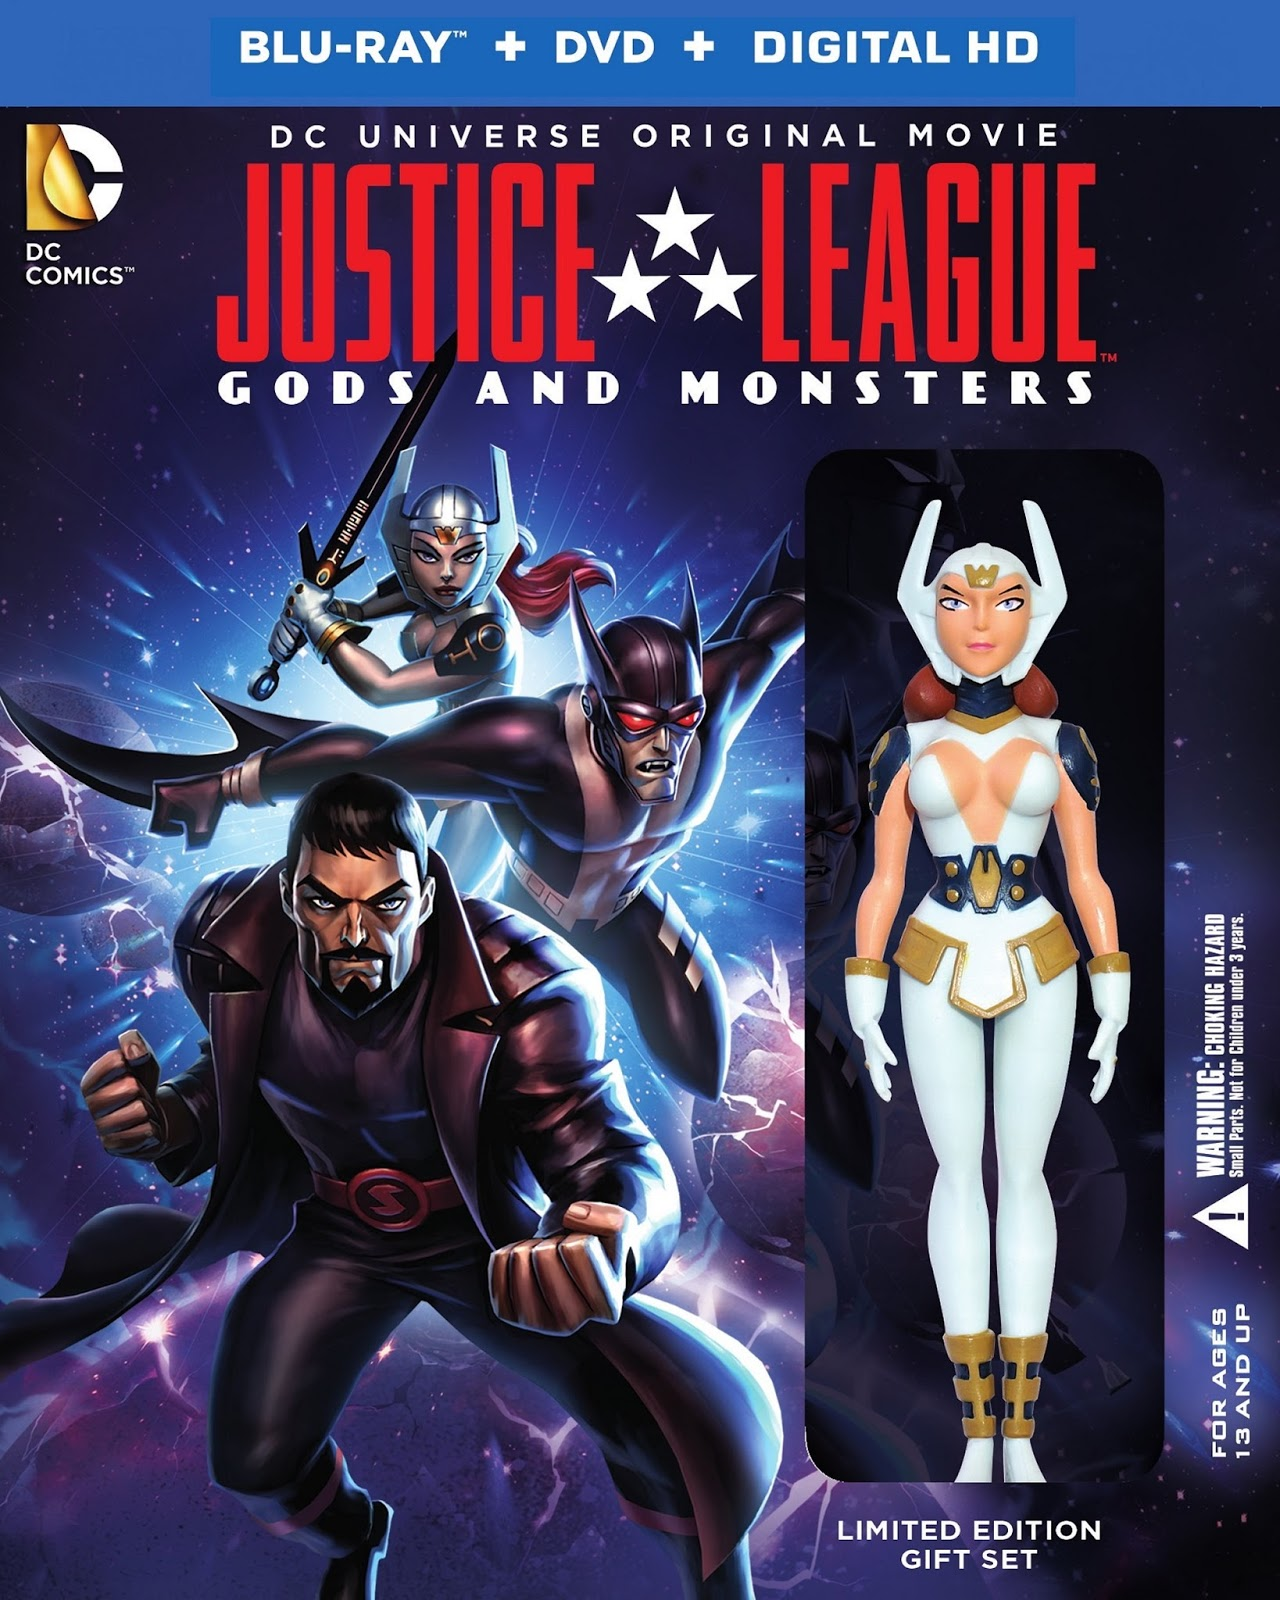 Liên Minh Công Lý - Justice League: Gods and Monsters